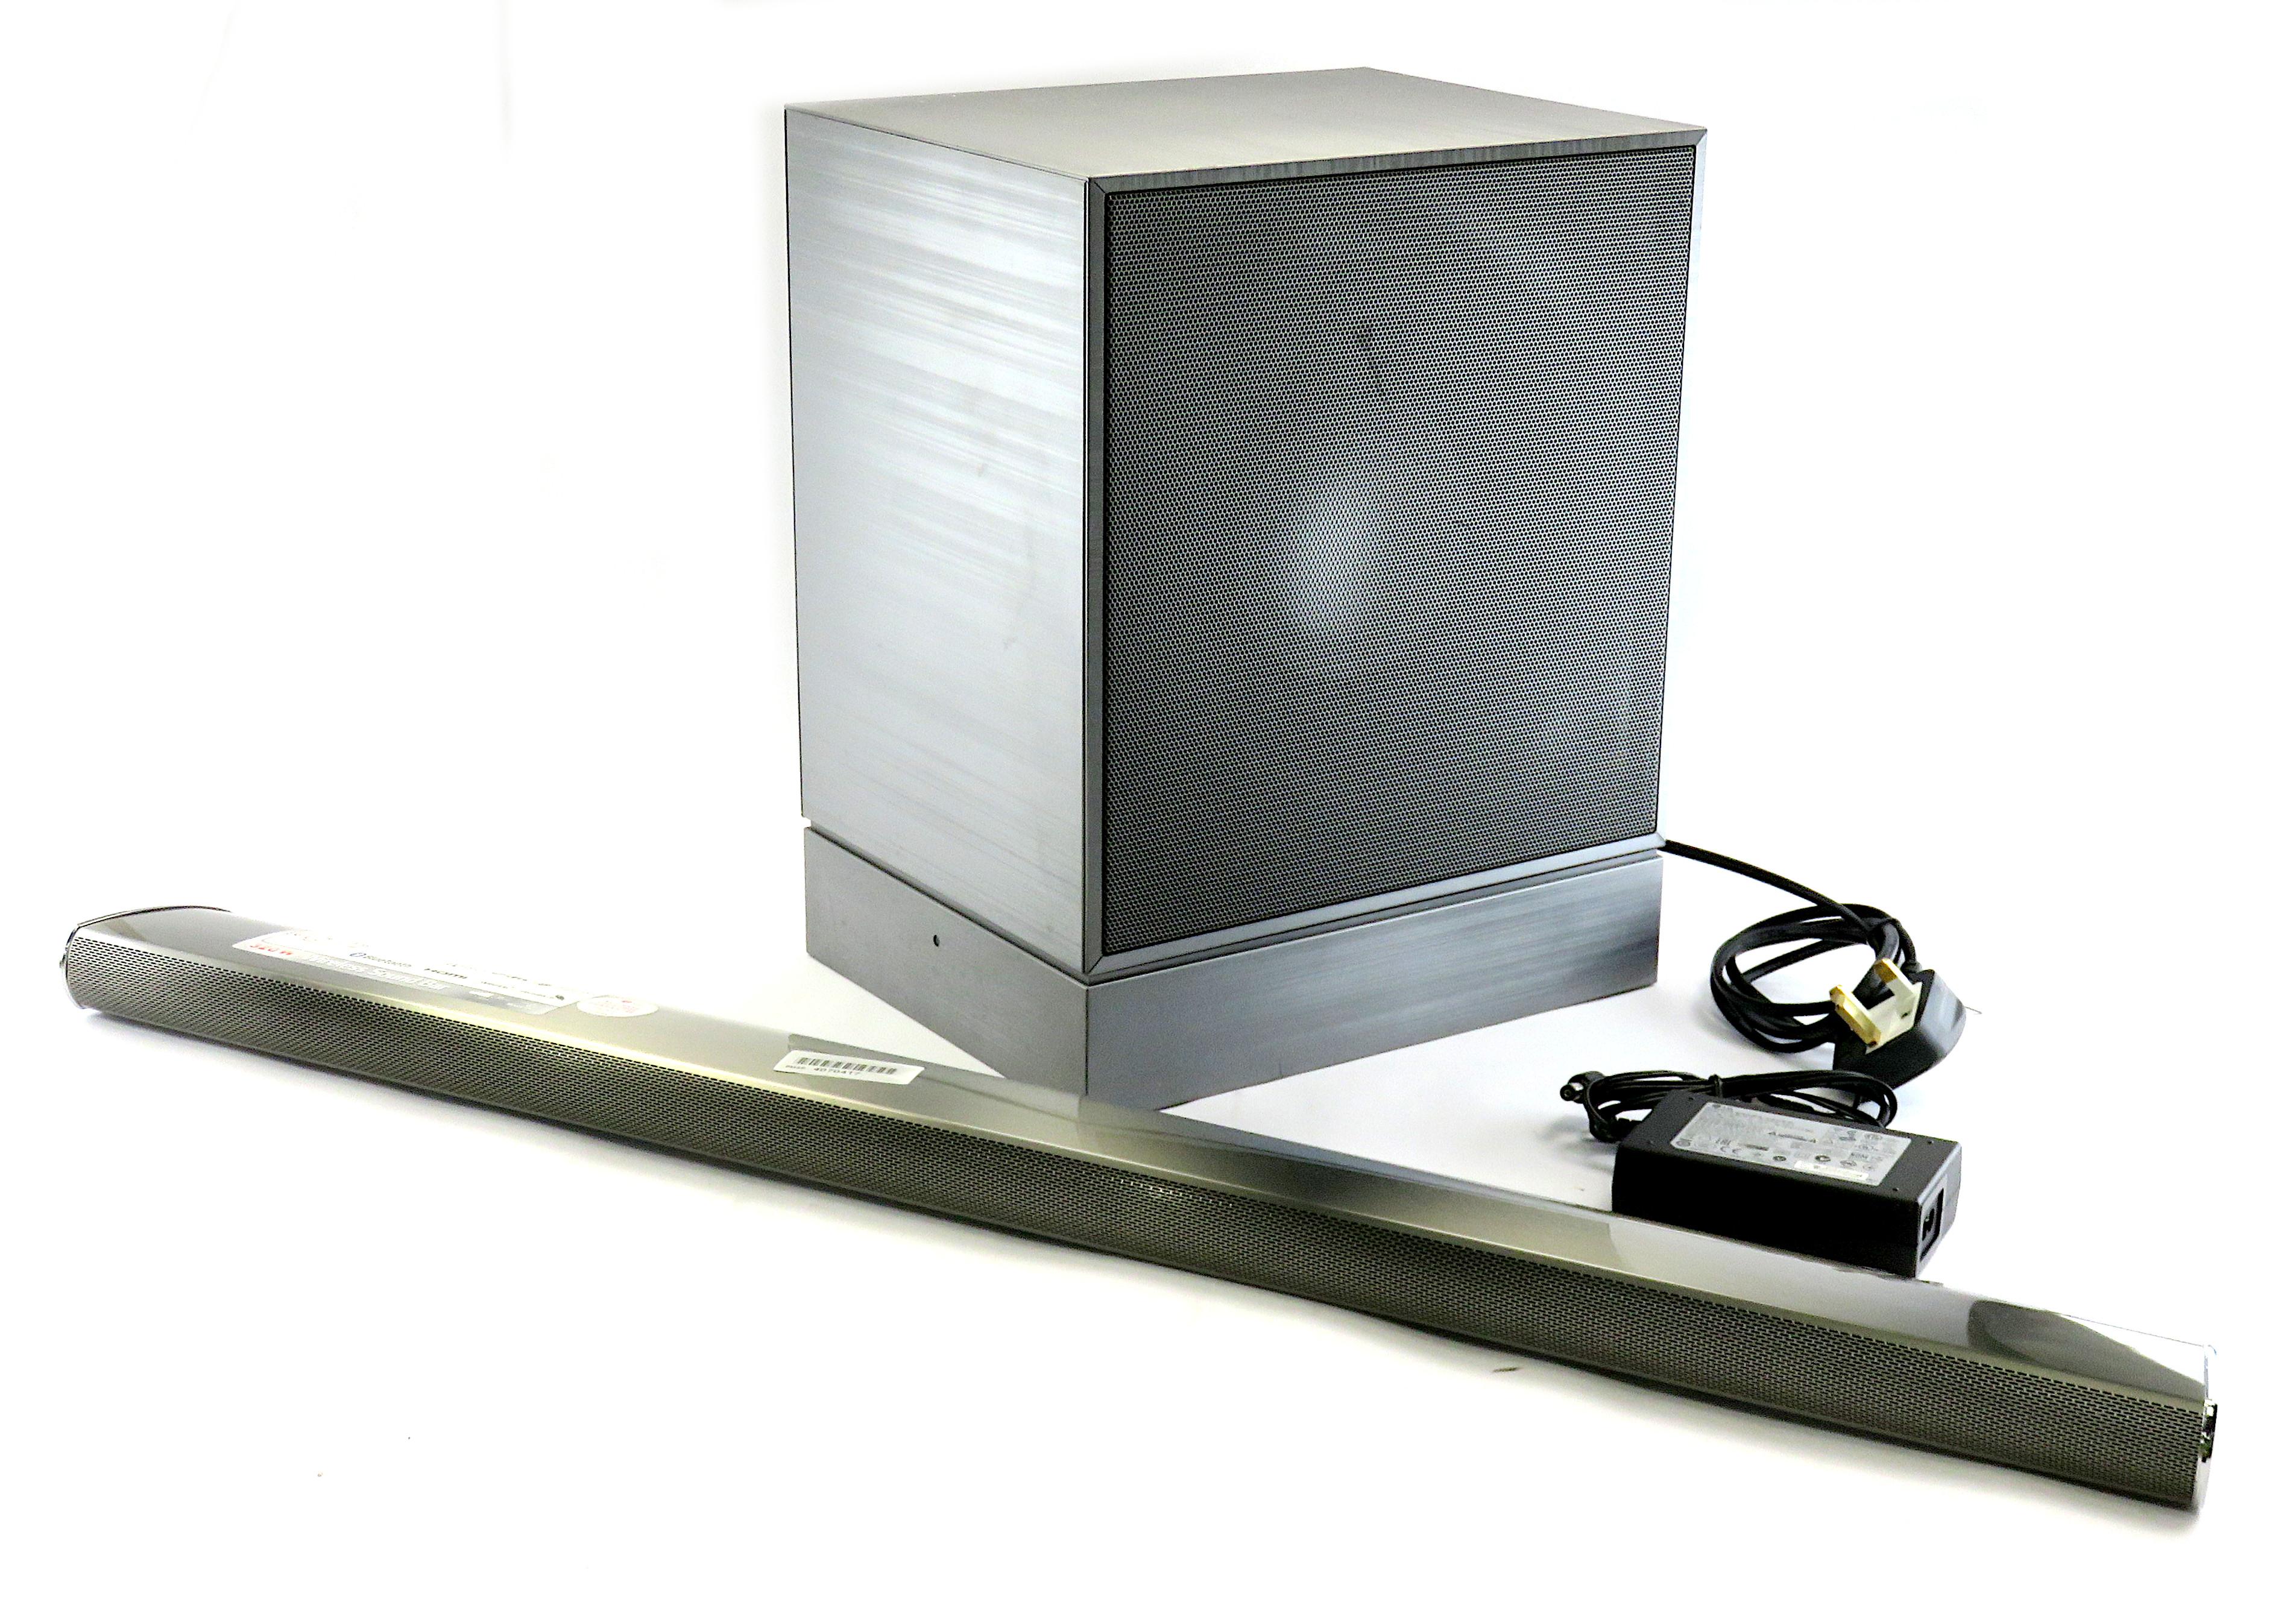 LG NB4540 320W 4.1Ch Wireless Soundbar w/ S44A1-D Subwoofer